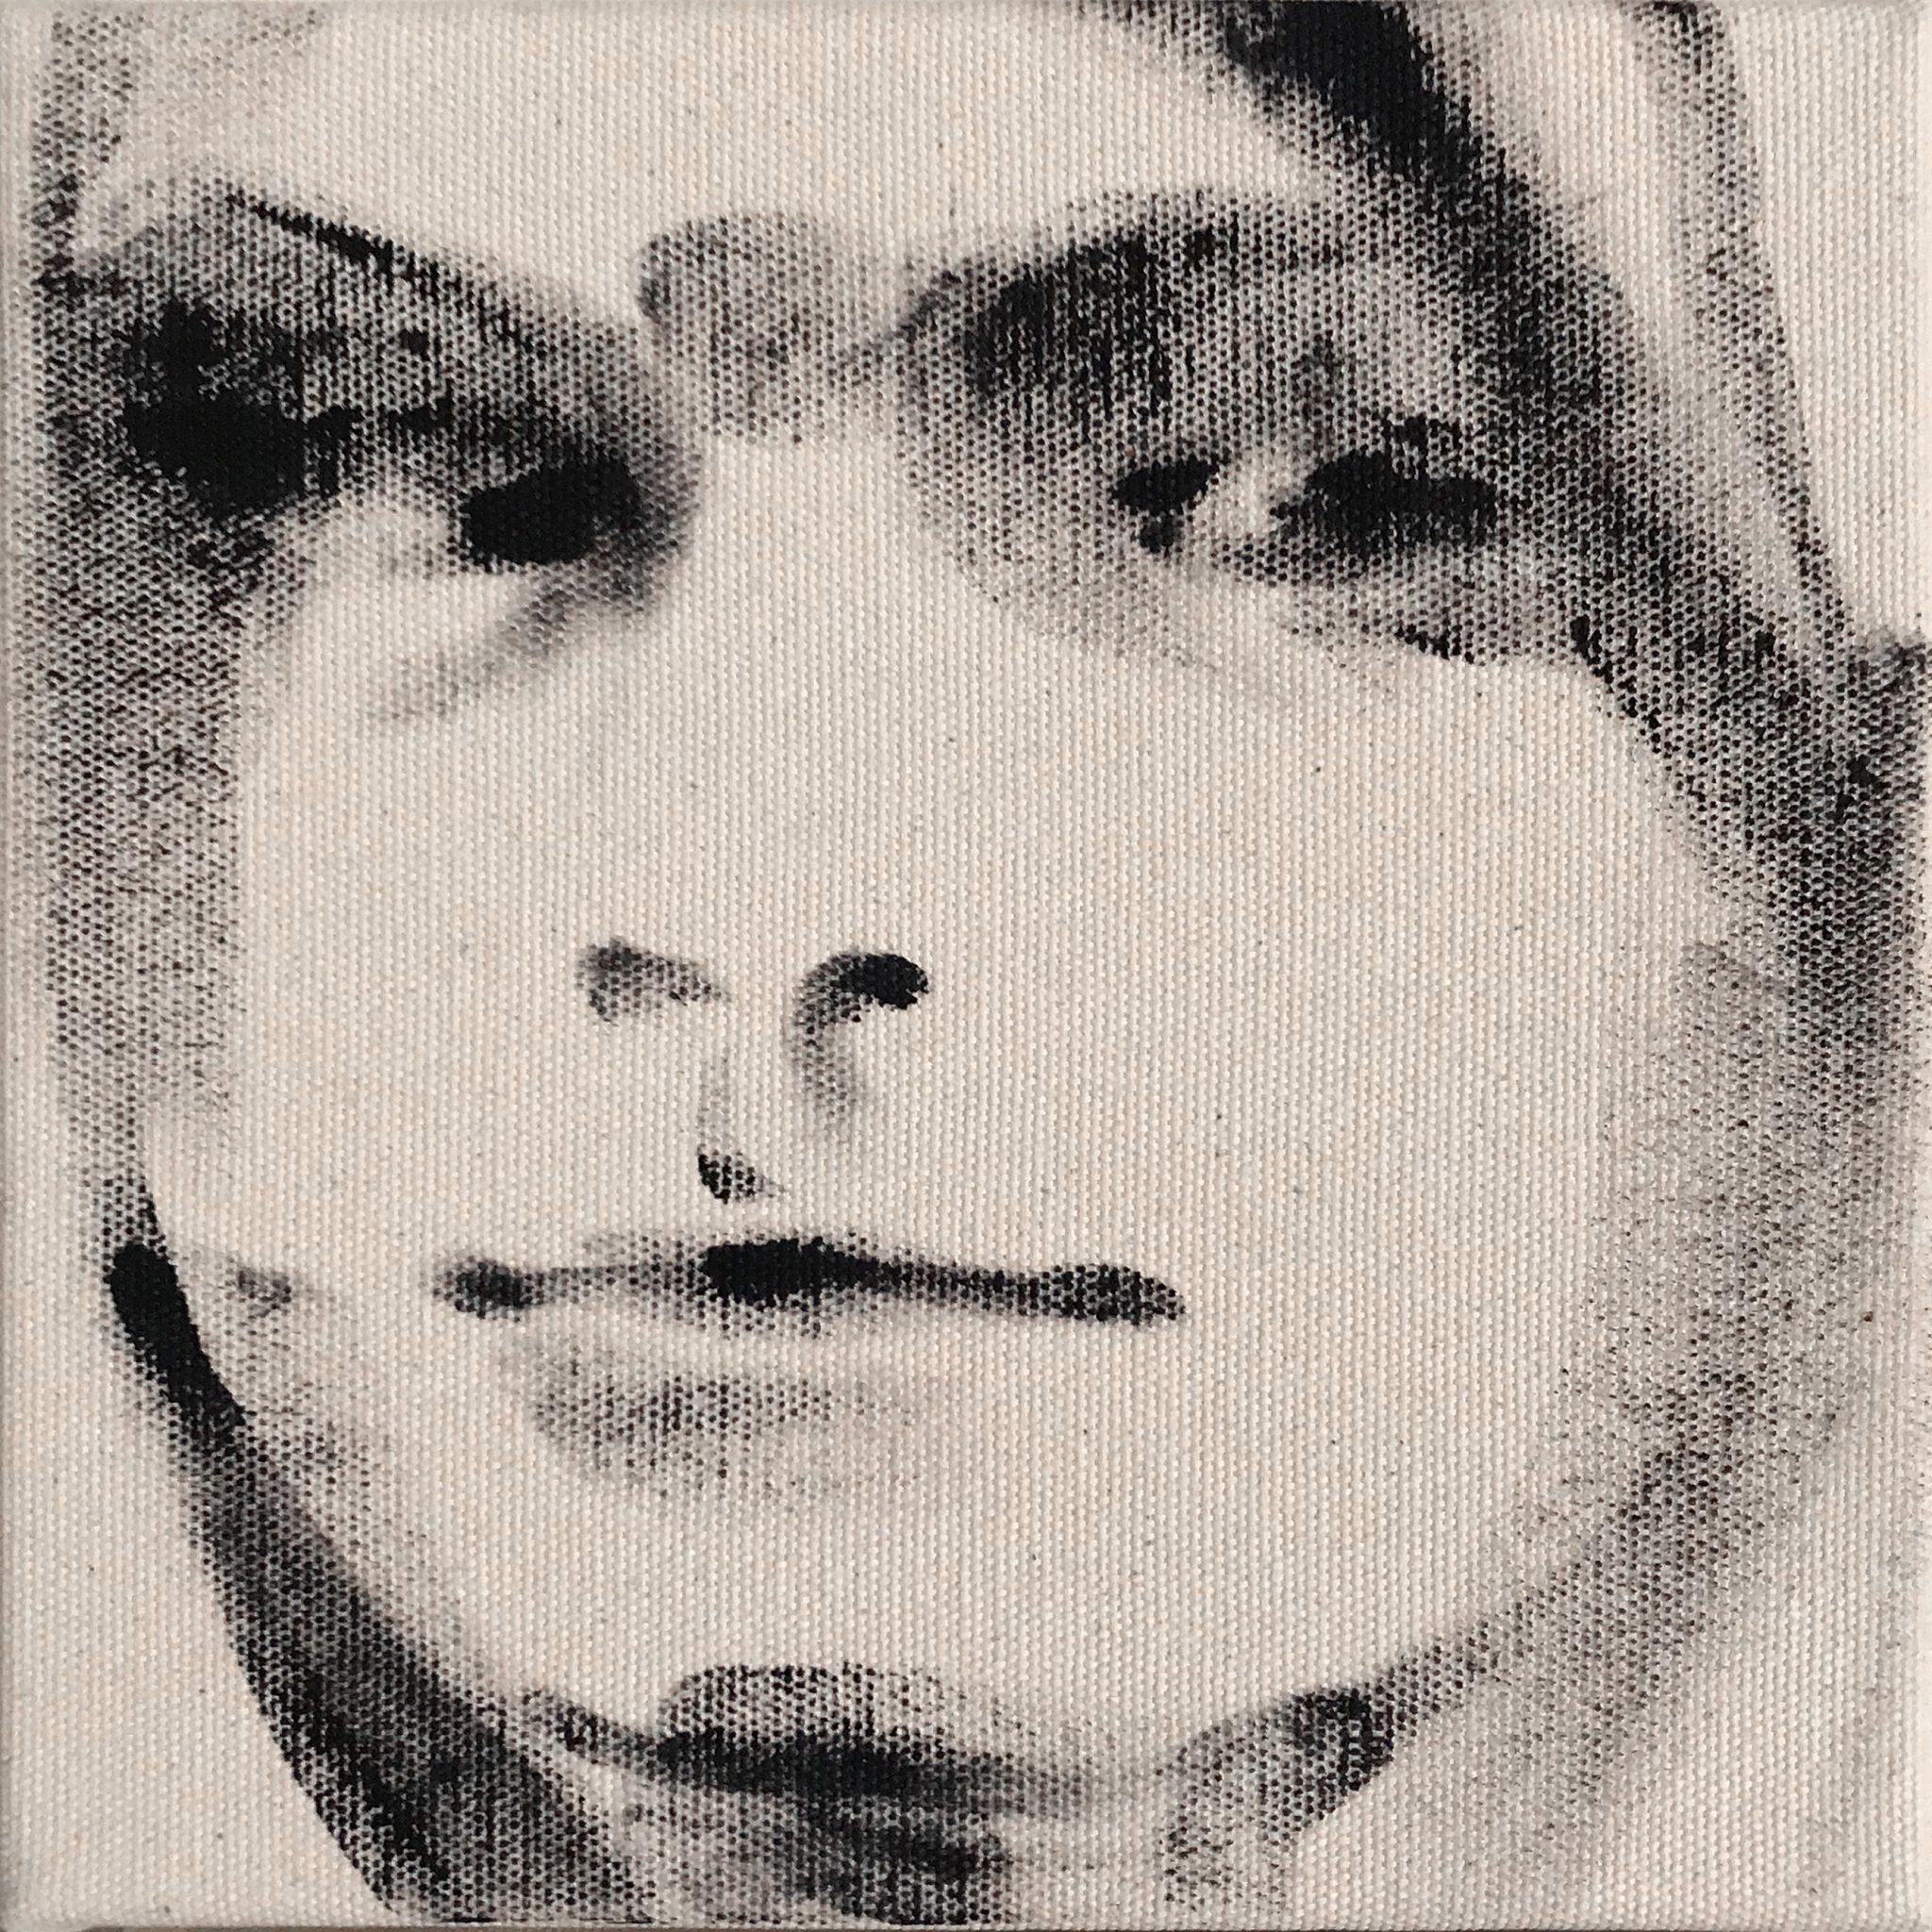 Kat 15x15 cm acrylics on canvas #SOLD